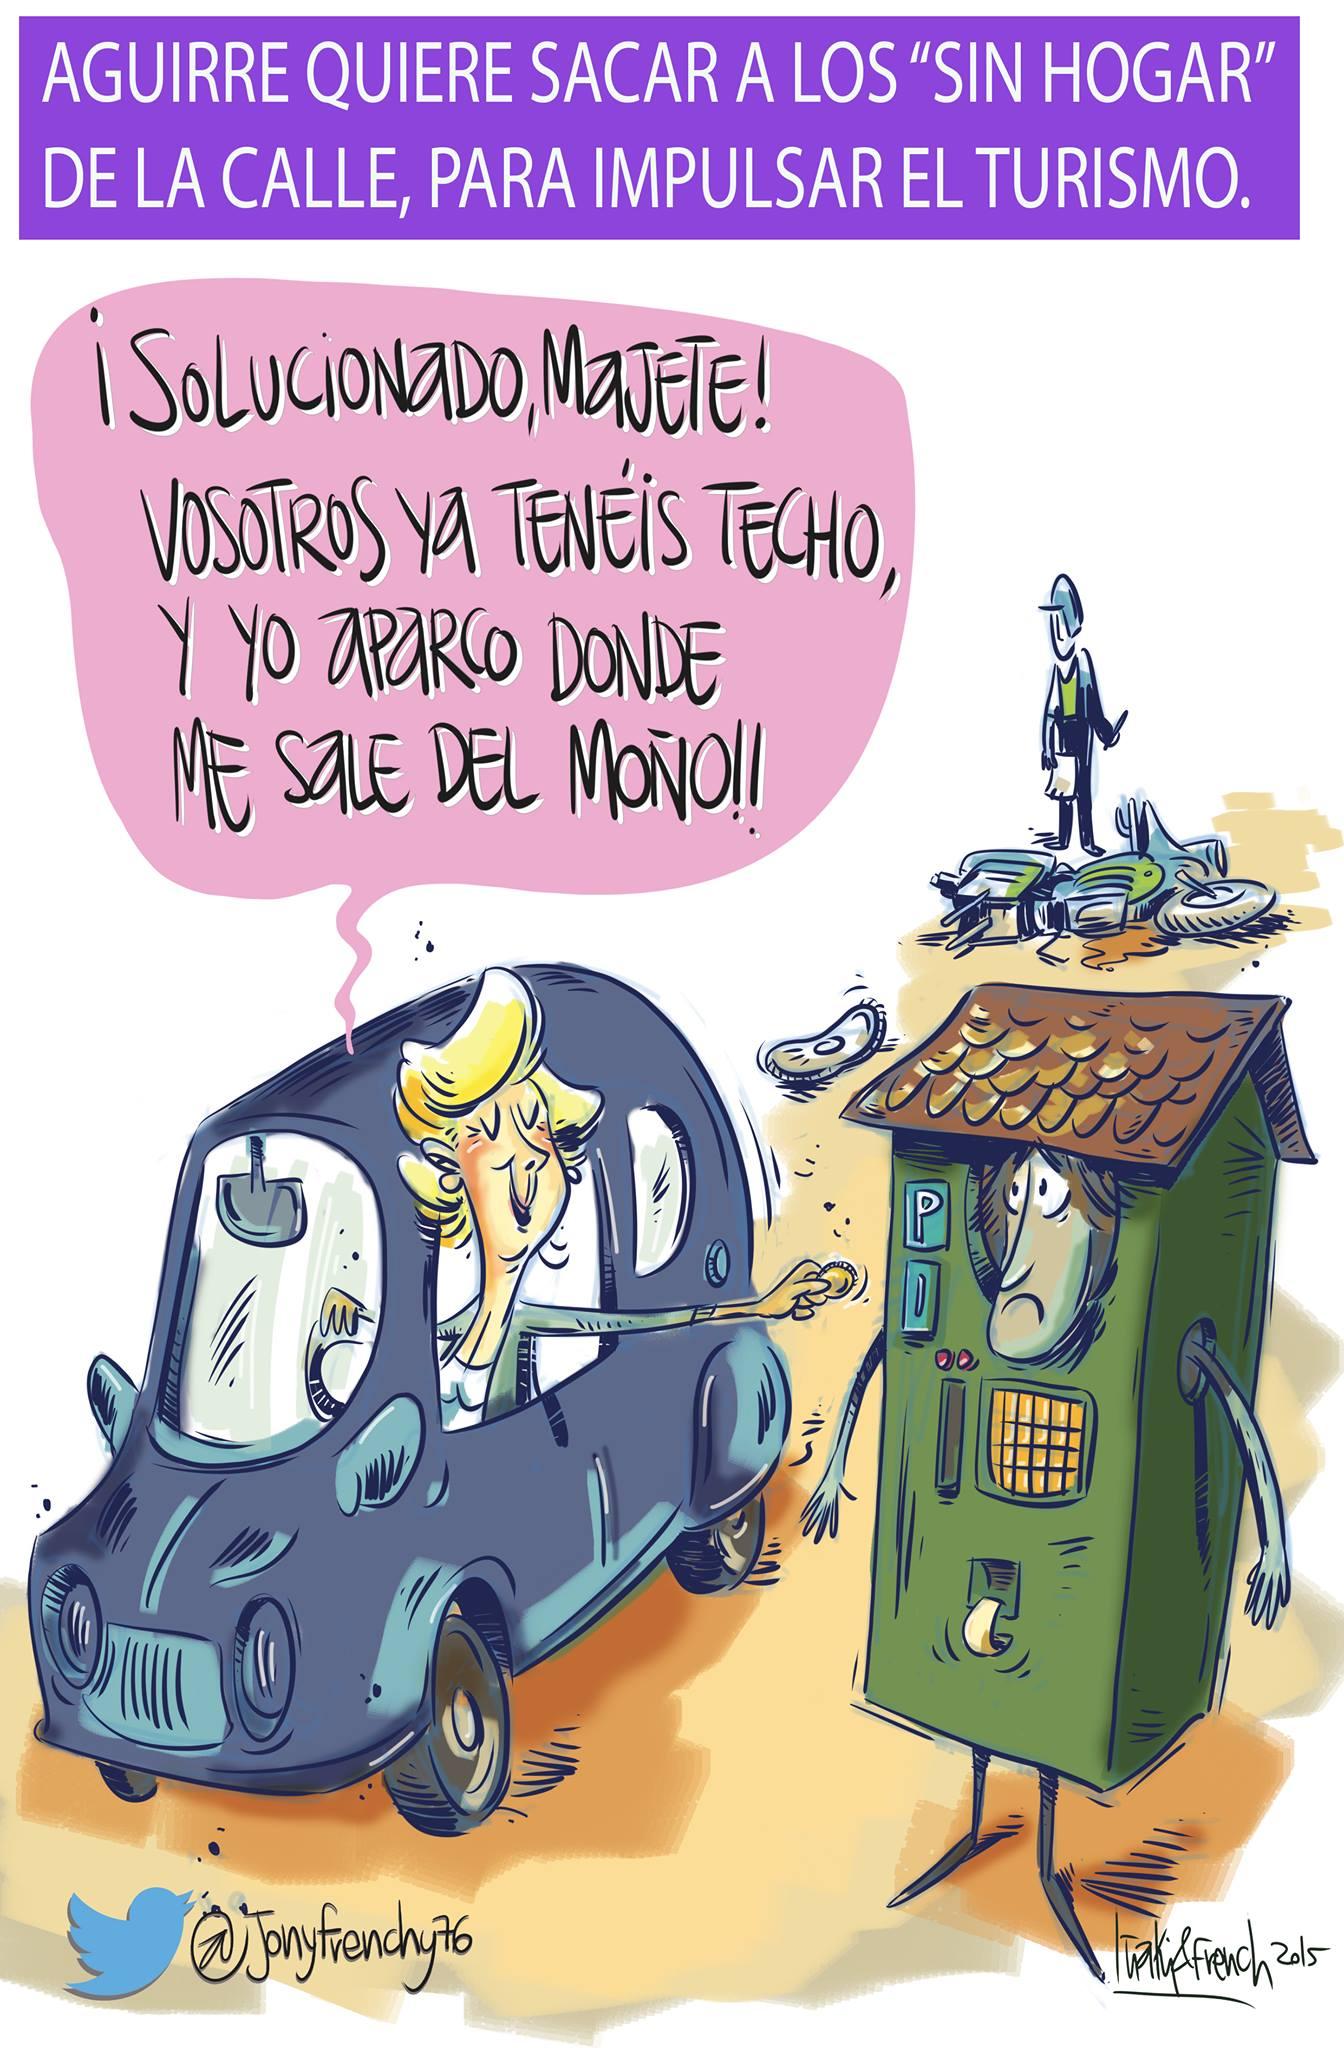 Aguirre Parquímetro